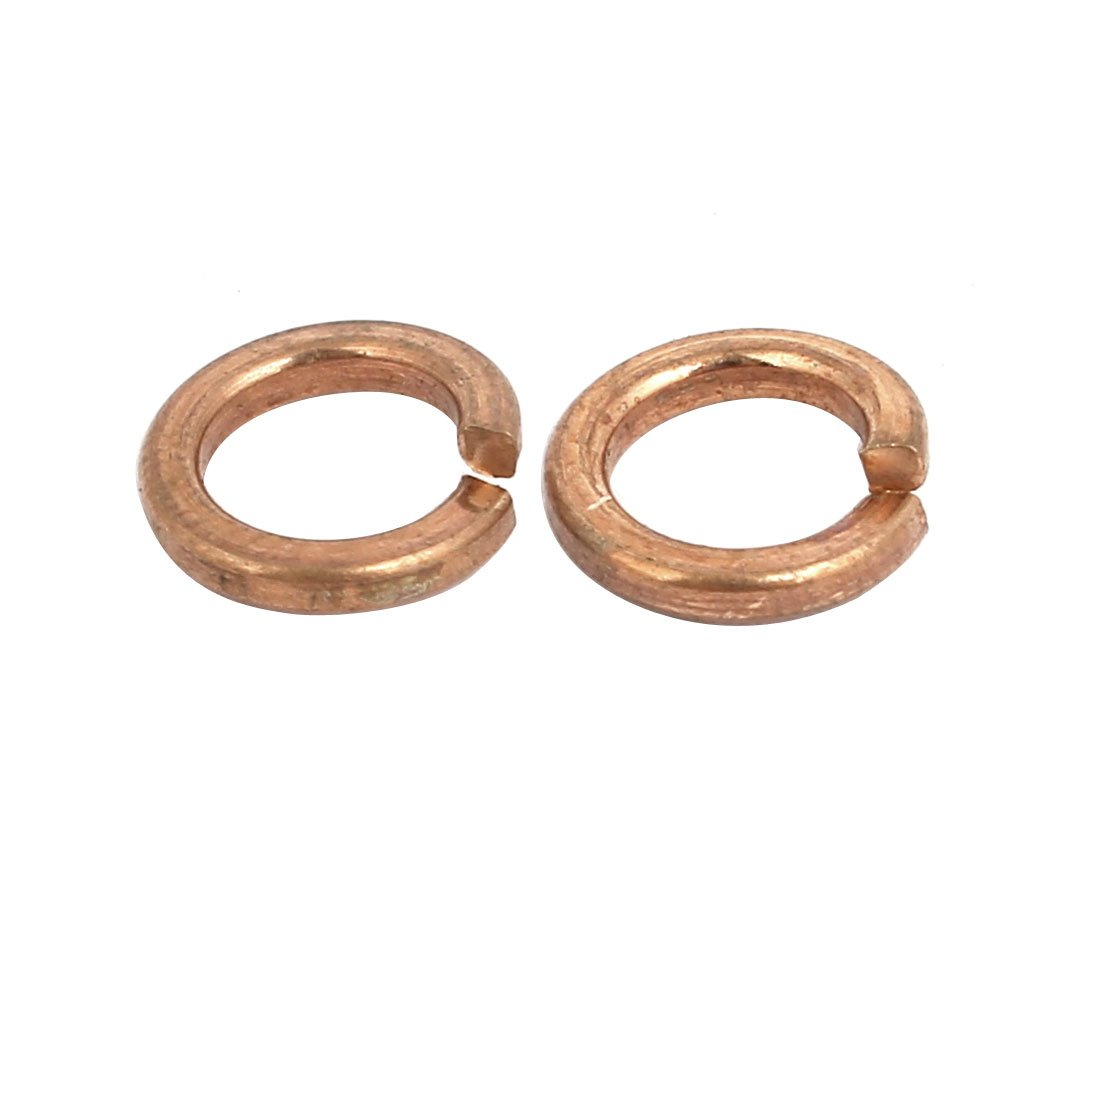 uxcell 20pcs 5mm Inner Dia Brass Split Lock Spring Washer Gasket Gold Tone